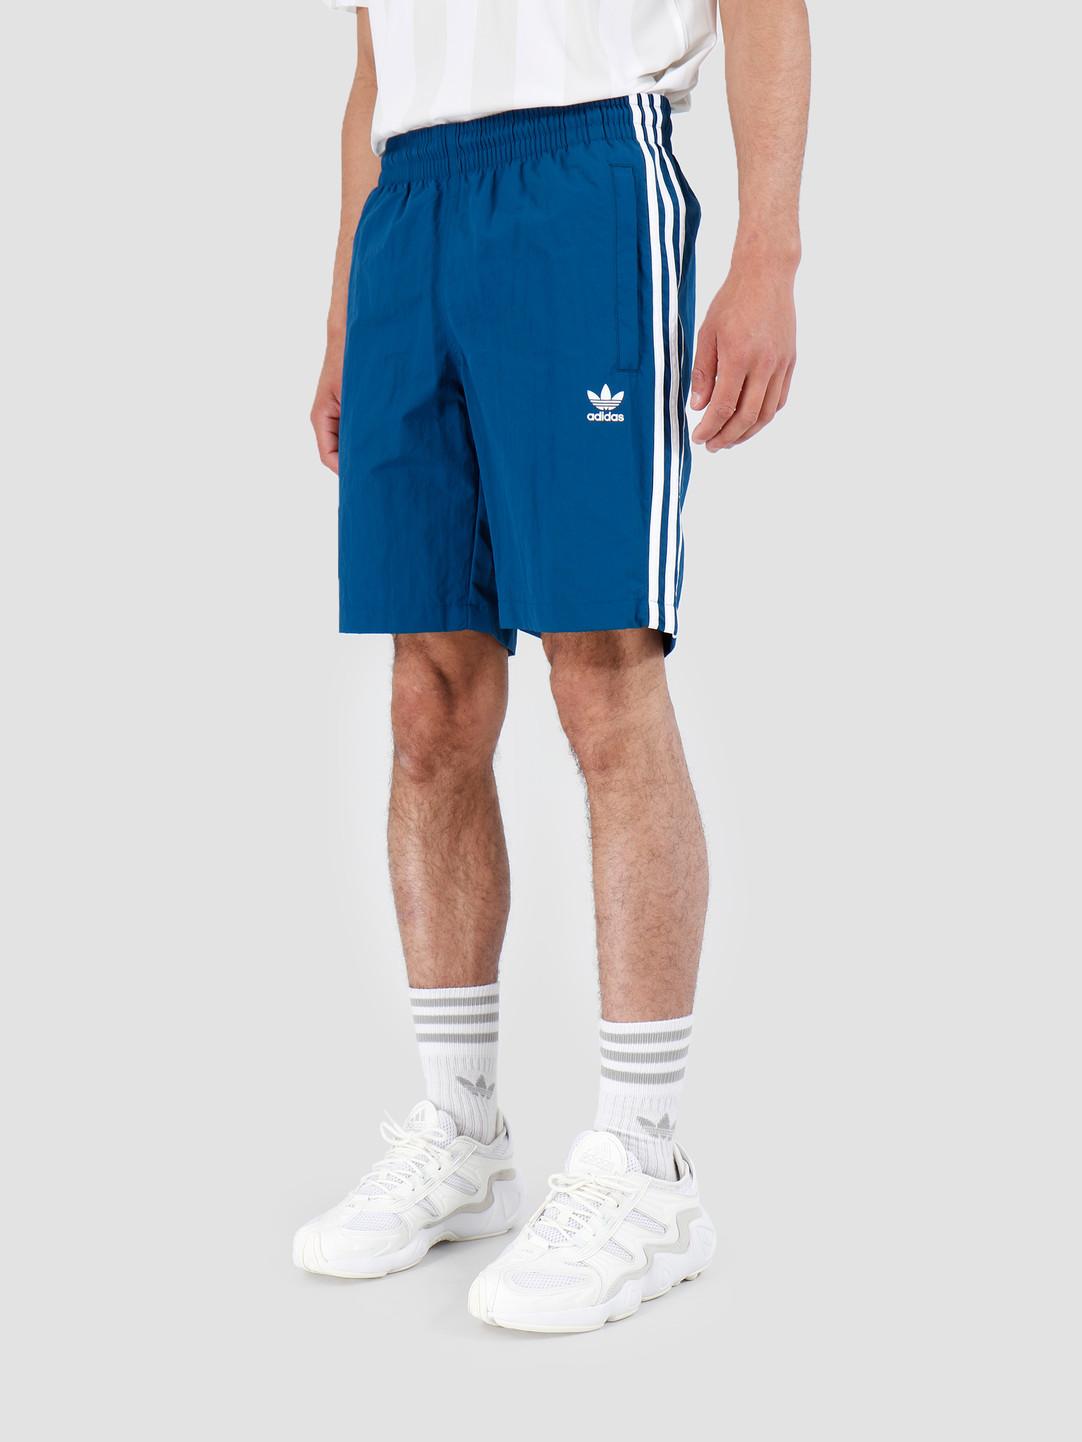 881337593d adidas 3-Stripes Swim Legmar DV1578 | FRESHCOTTON